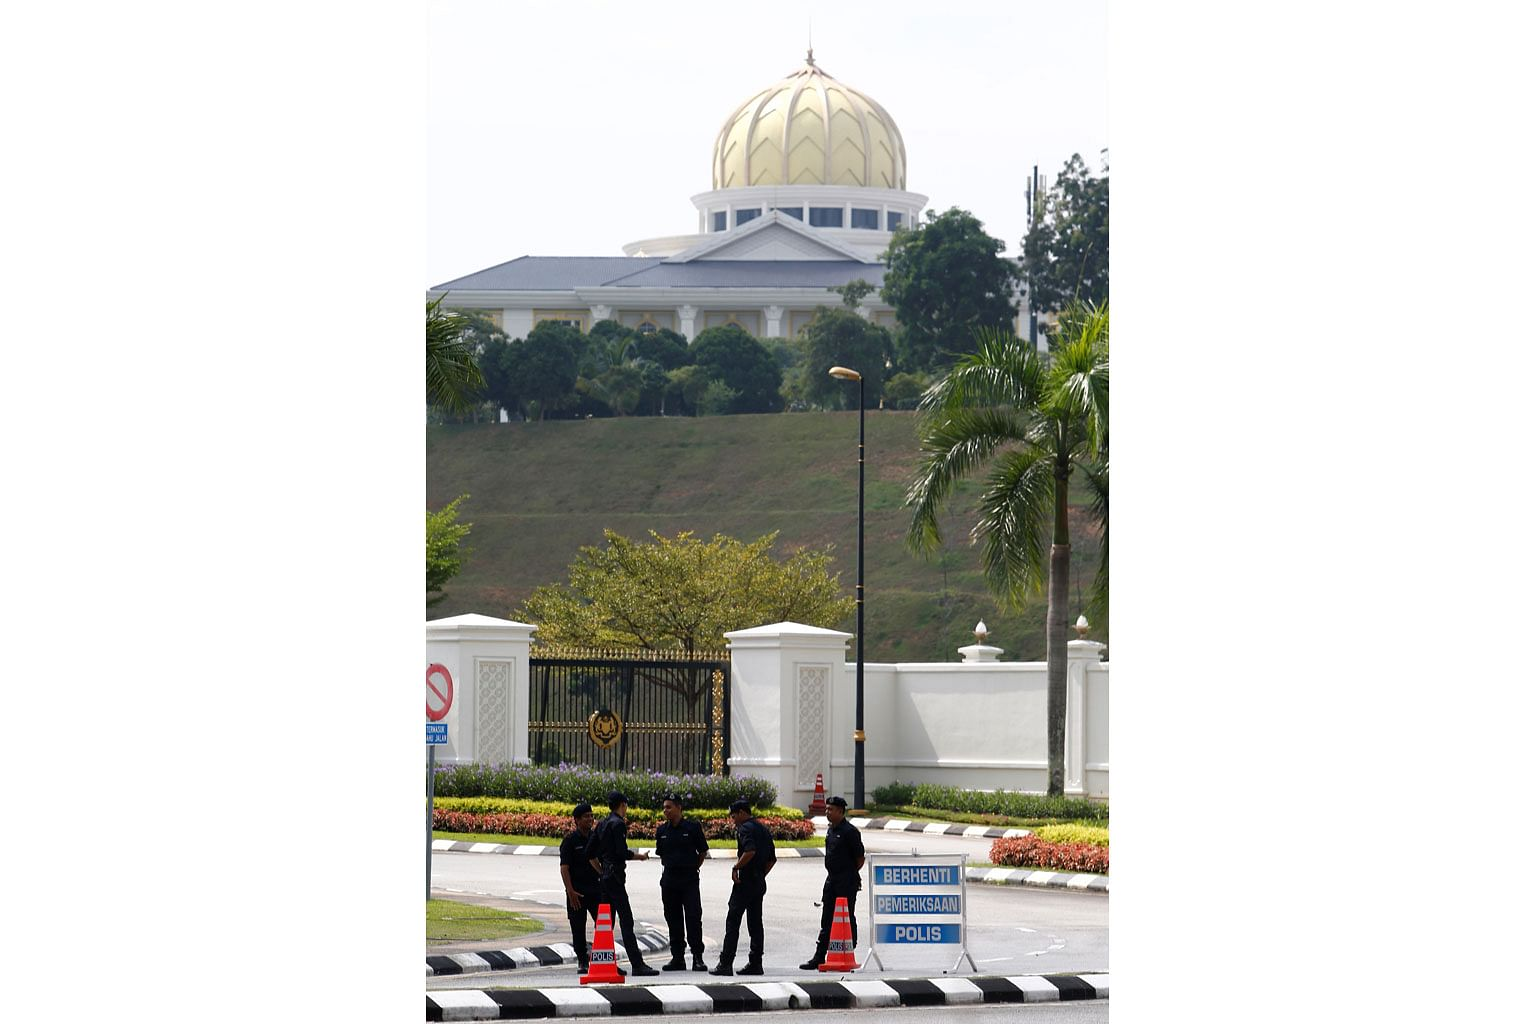 Bukti ketokohan Mahathir dalam catur politik